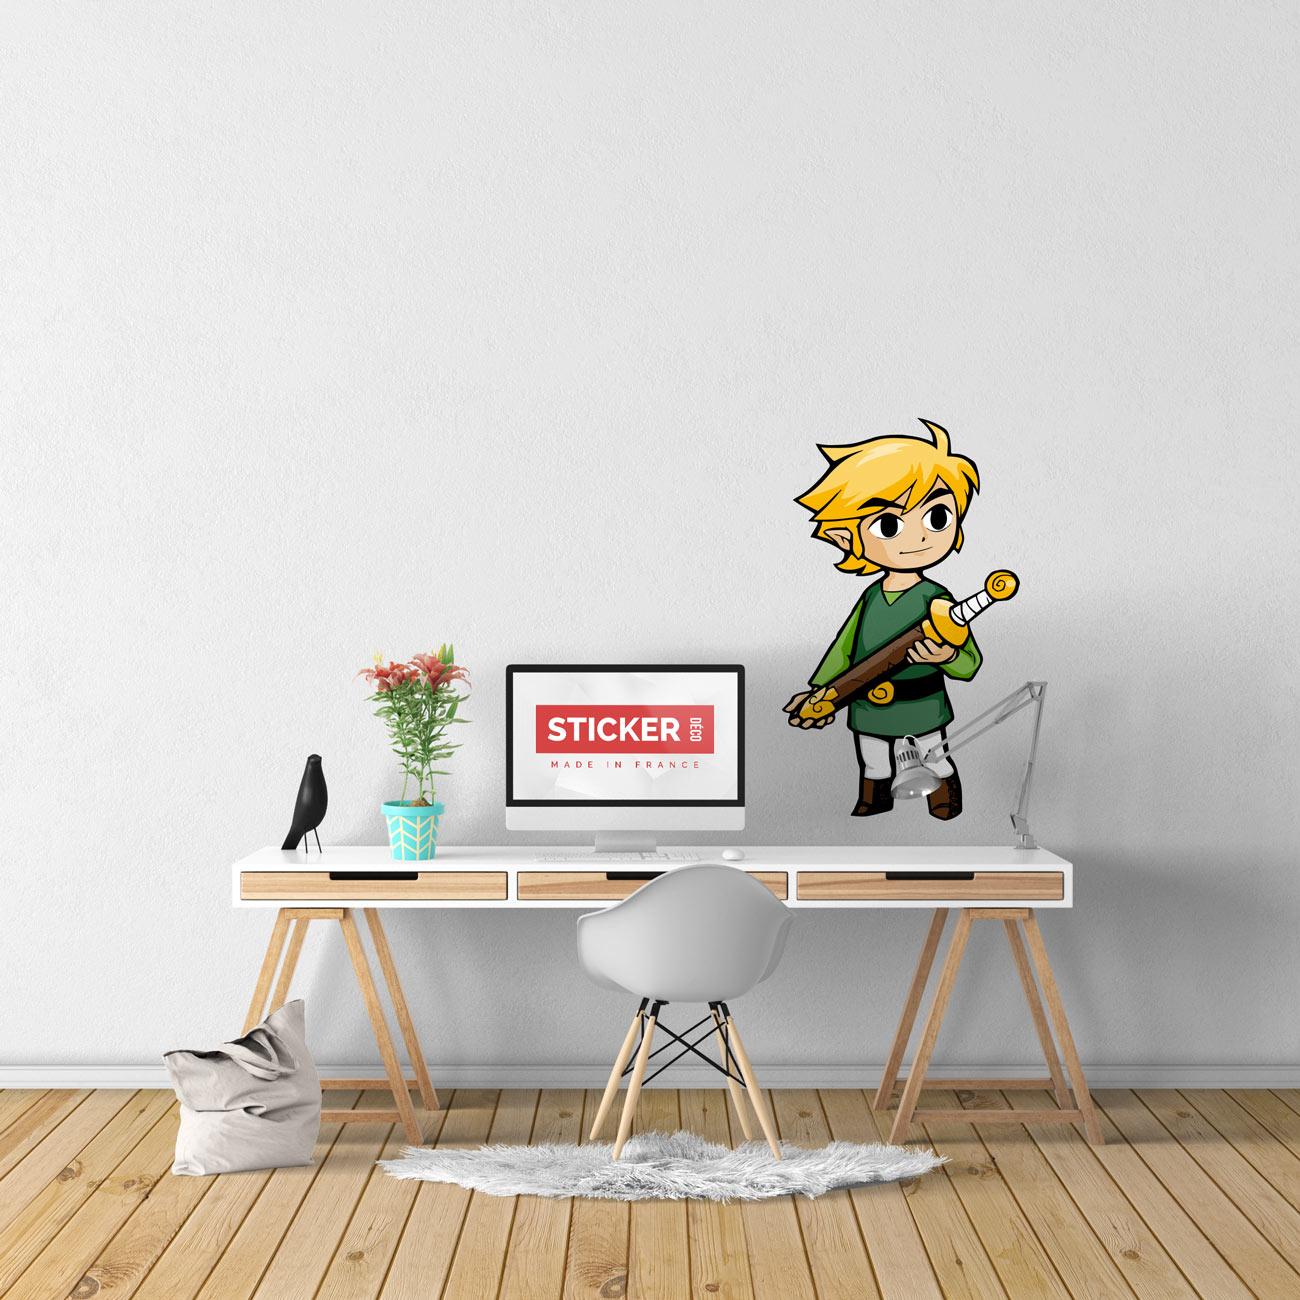 Sticker Mural Zelda Wind Waker Link - Sticker Deco